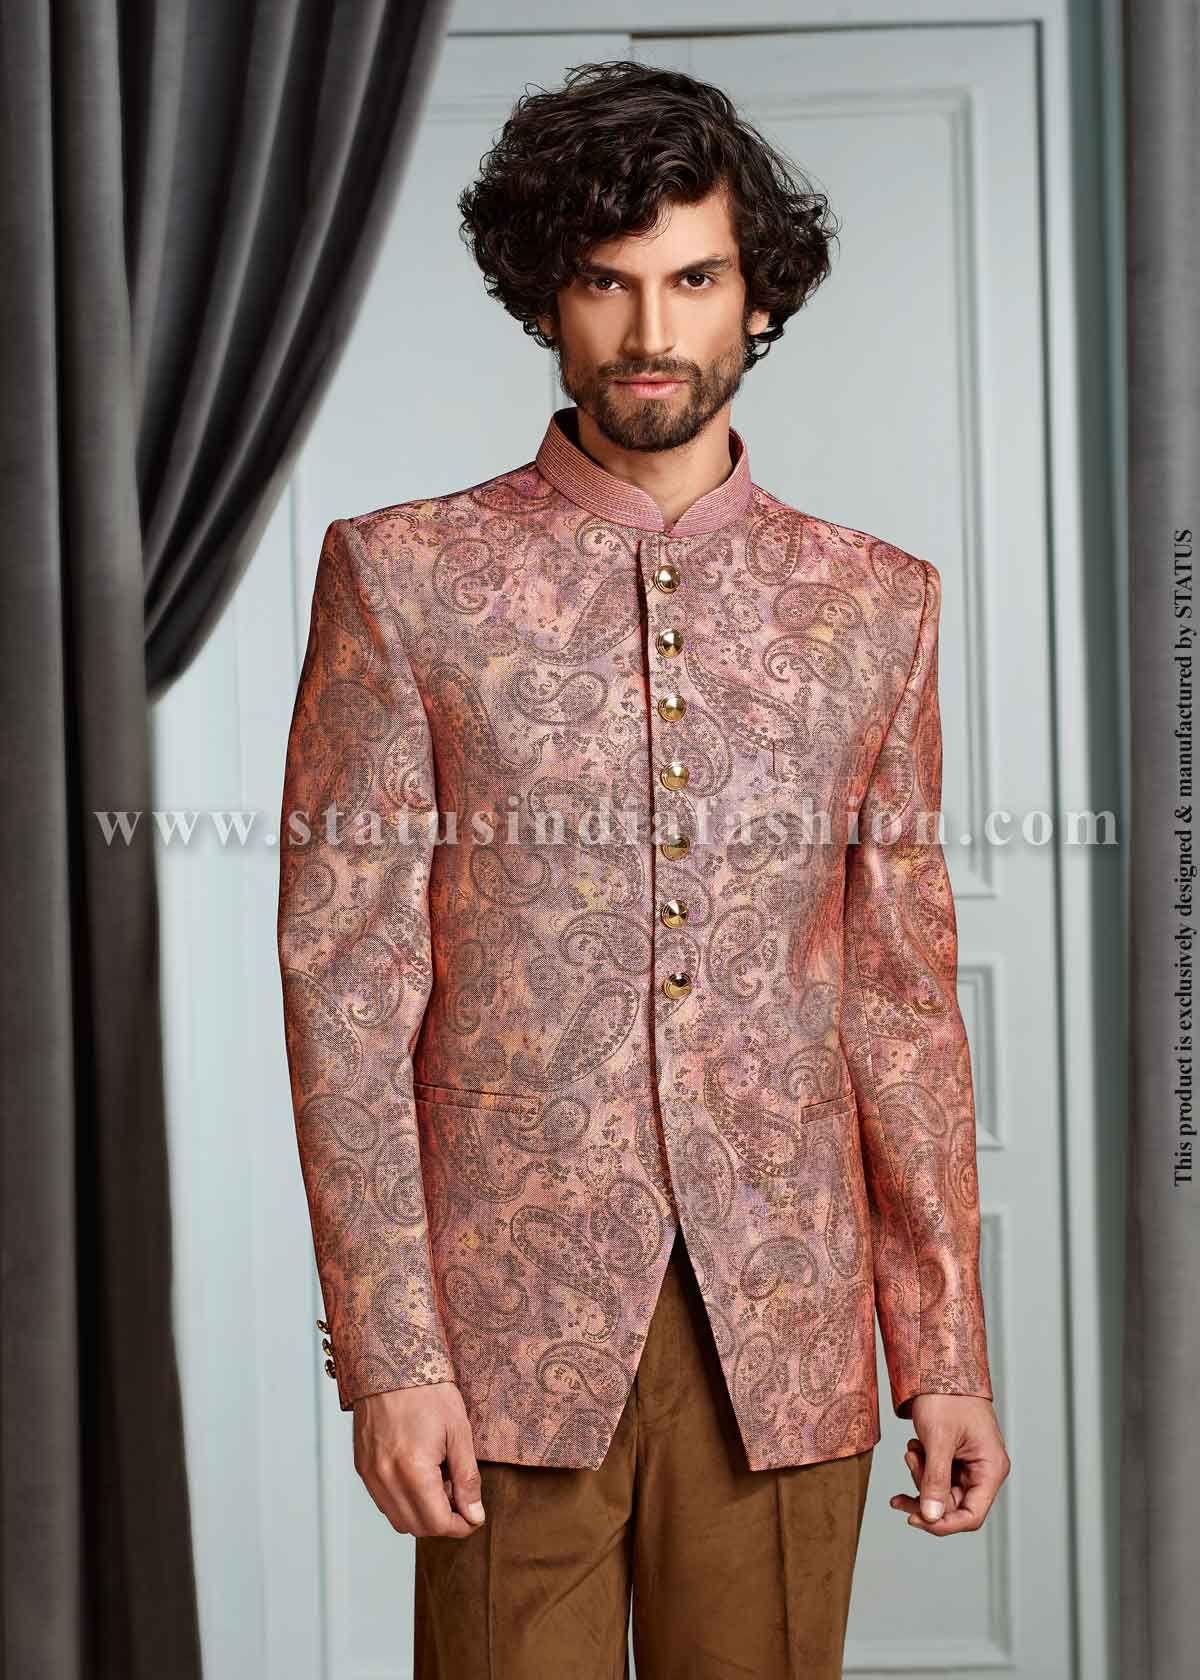 Designer jodhpuri sherwani indian wedding wear groom sherwani